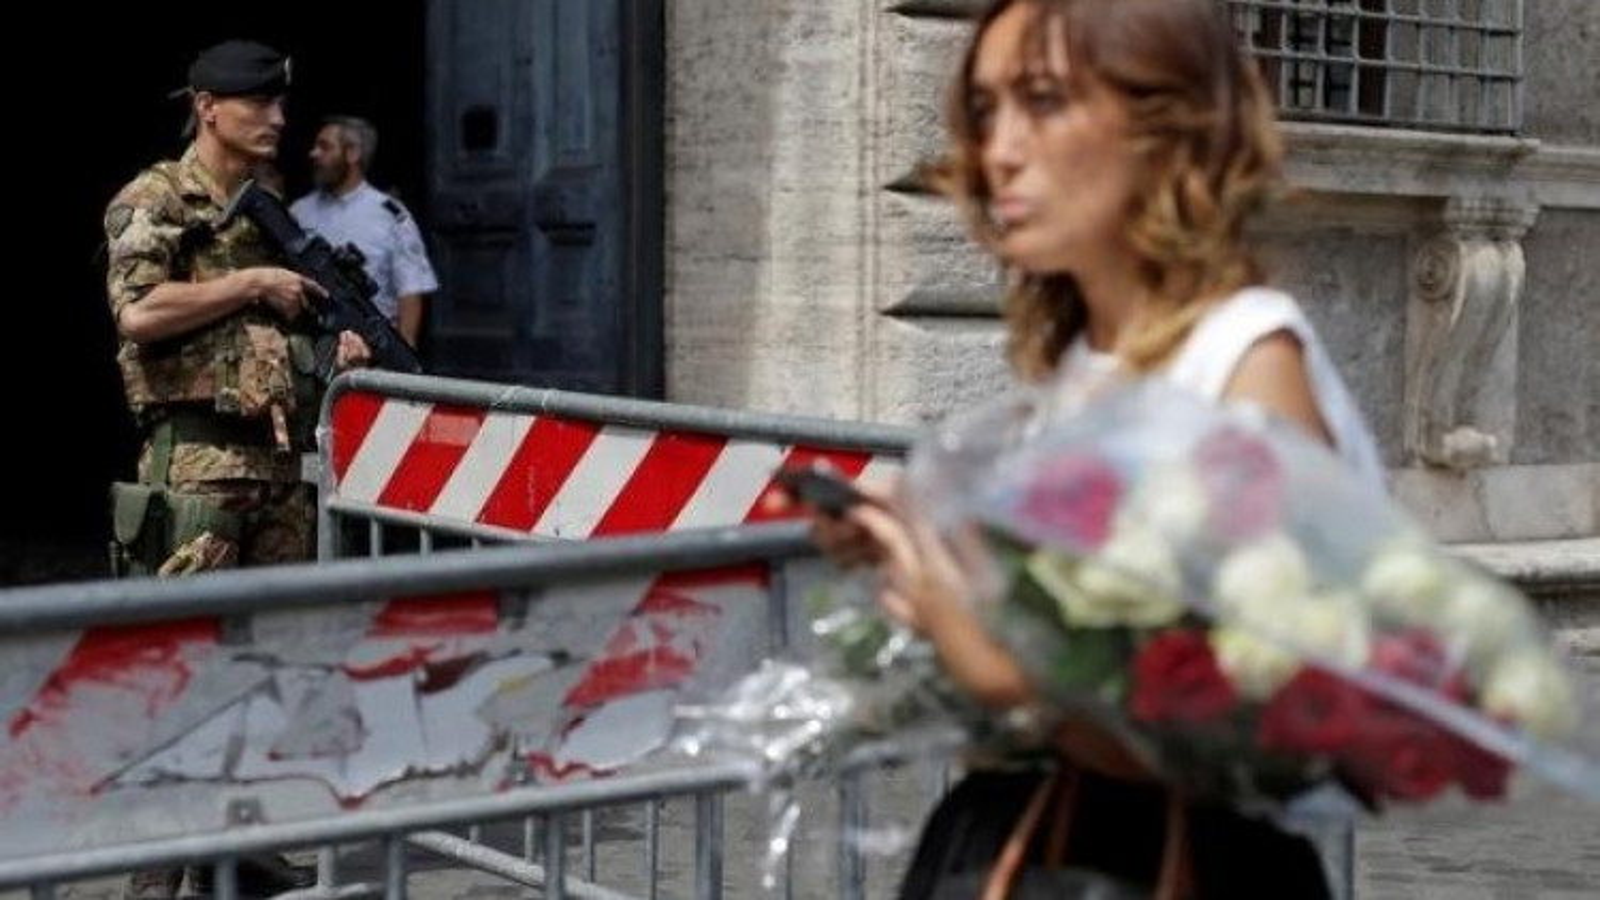 World unites in horror at Nice carnage, backs France